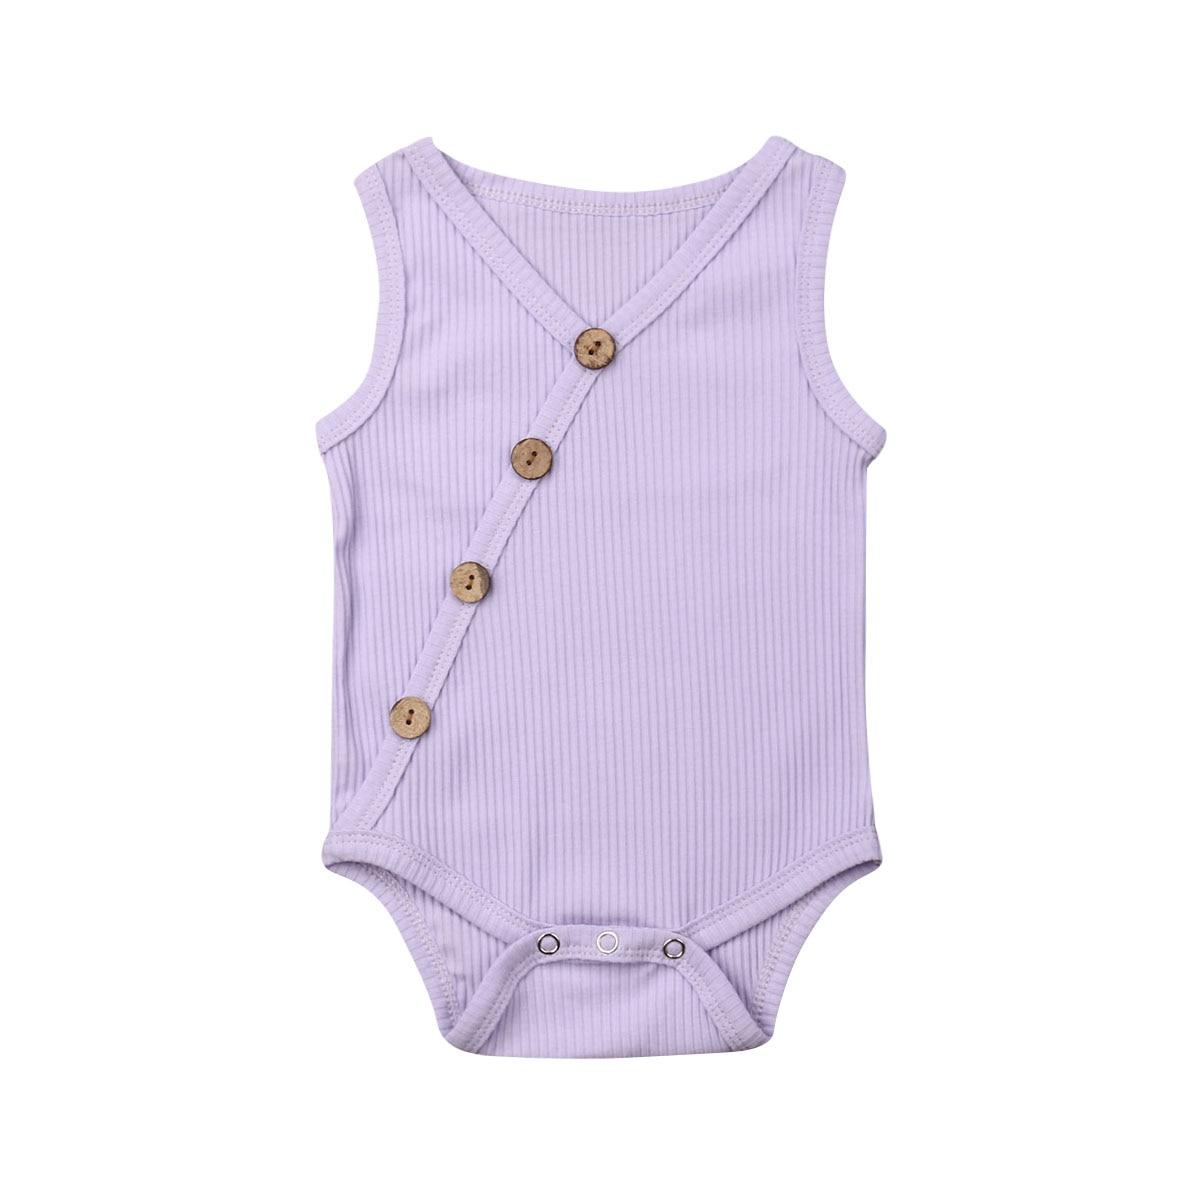 Summer Newborn Toddler Boy Girl Solid Jumpsuit Cotton Romper Sleeveless Button Outfit Summer Newborn Toddler Boy Girl Solid Jumpsuit Cotton Romper Sleeveless Button Outfit